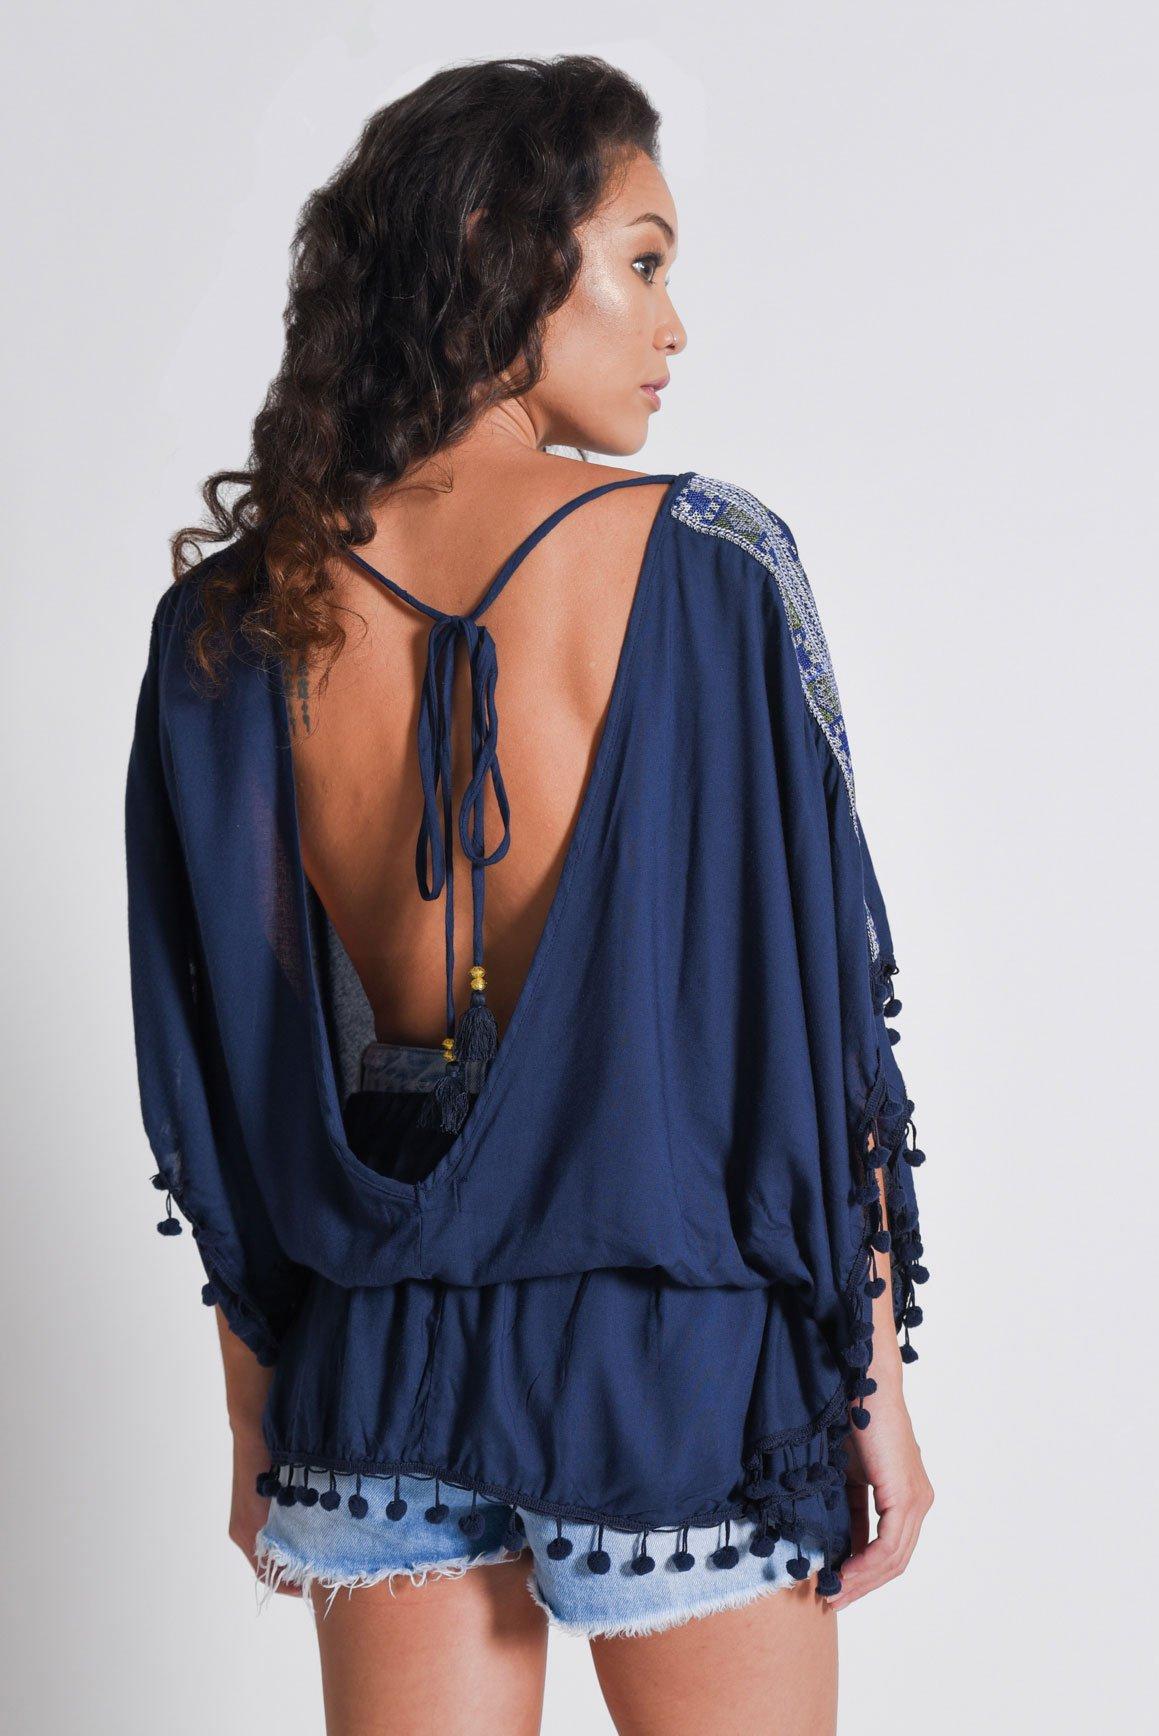 Aanya_Bohemian_Women_s_Blue_Backless_Poncho_Indigo-_5-of-5